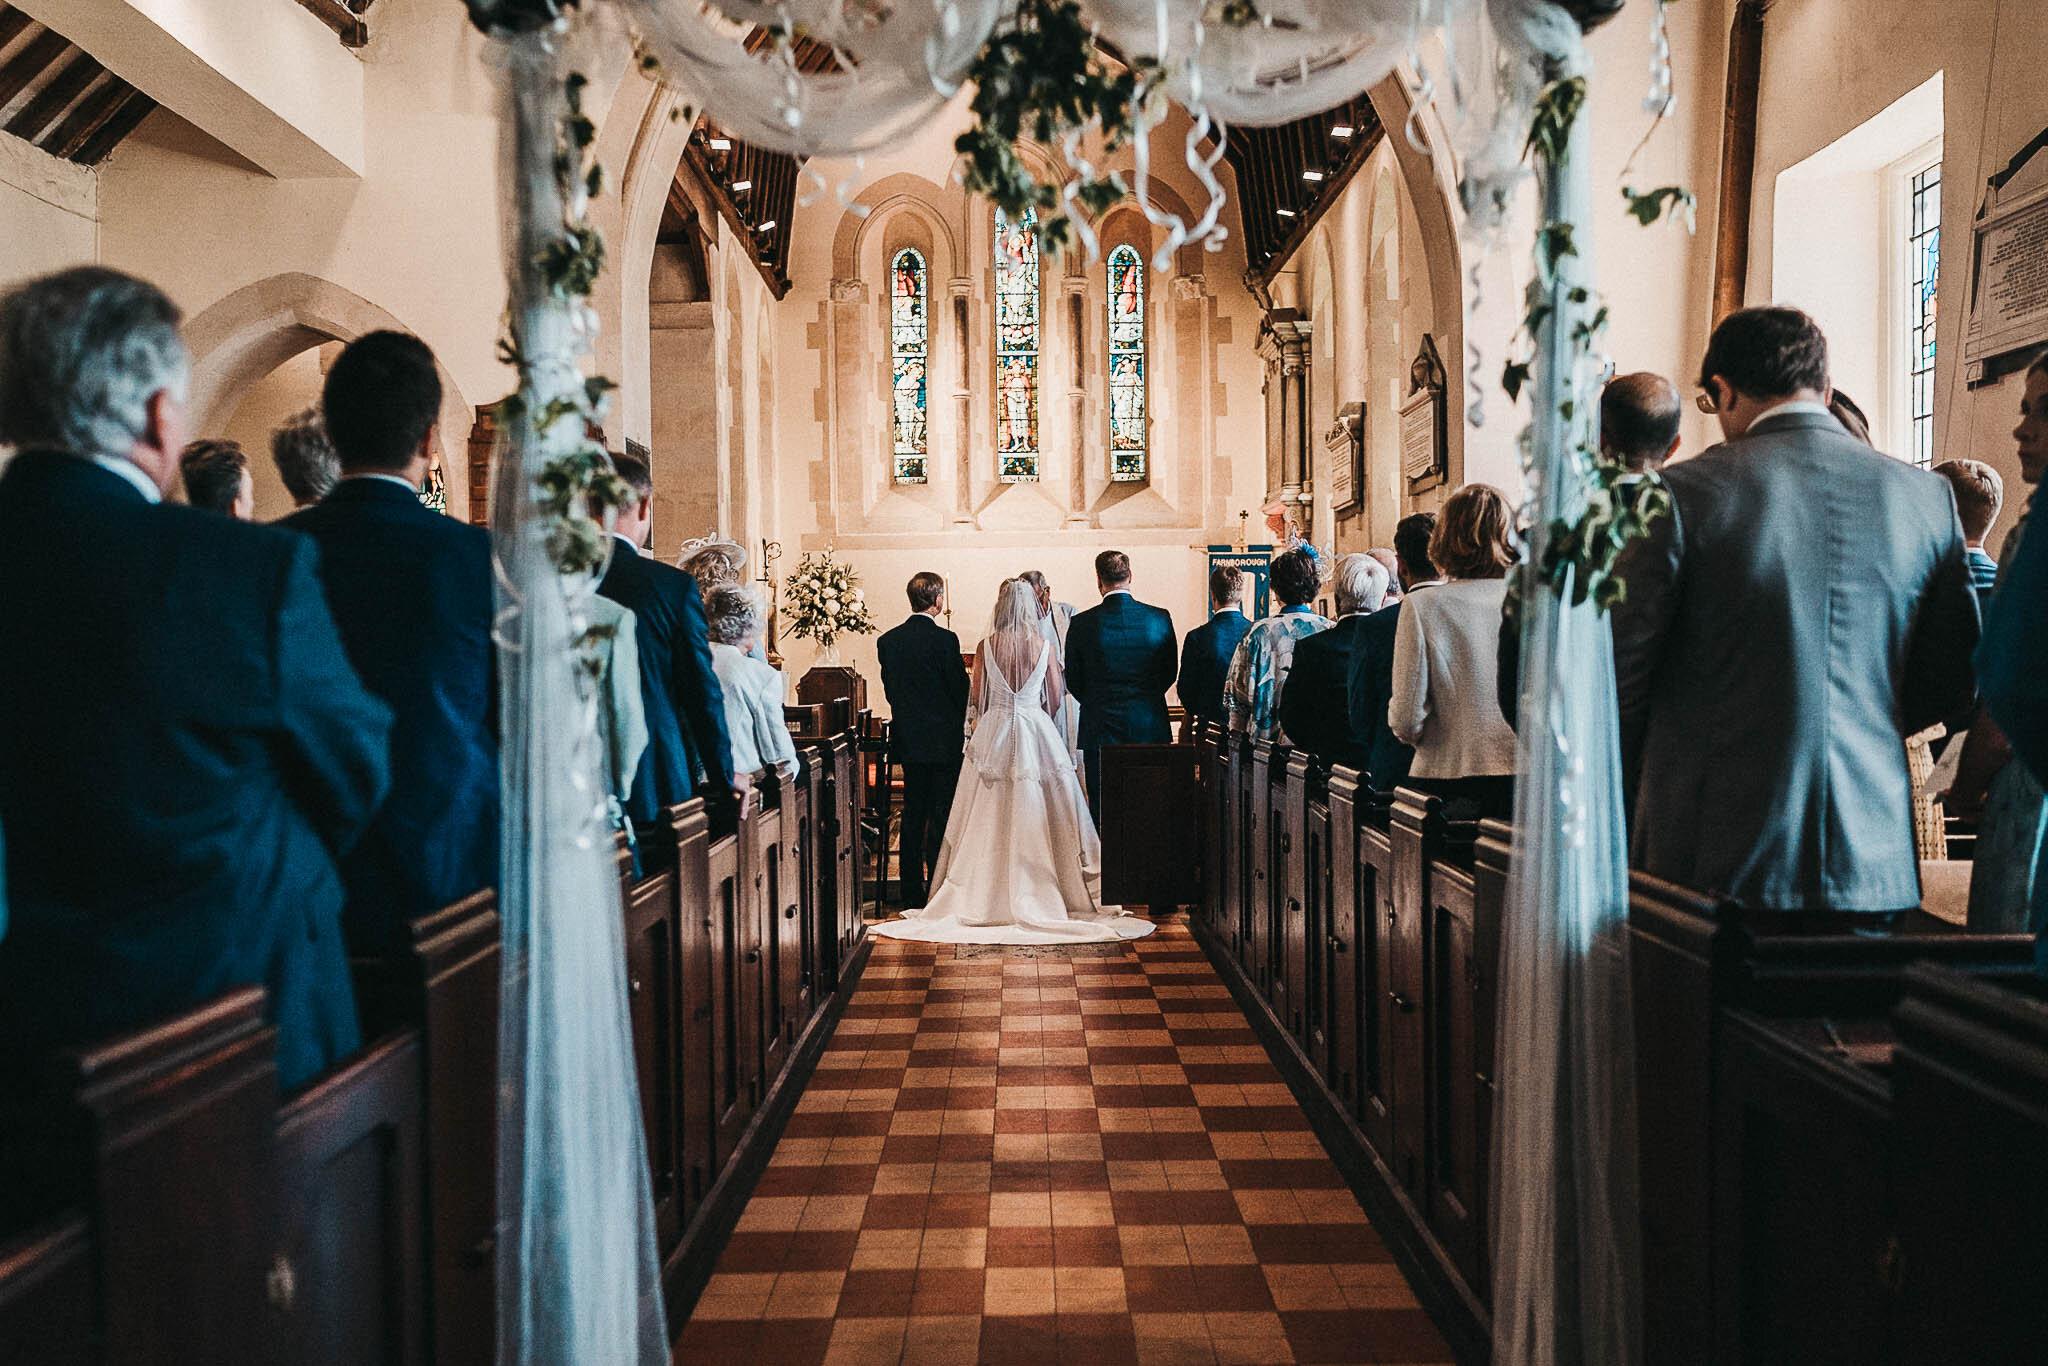 kent-church-wedding-ceremony